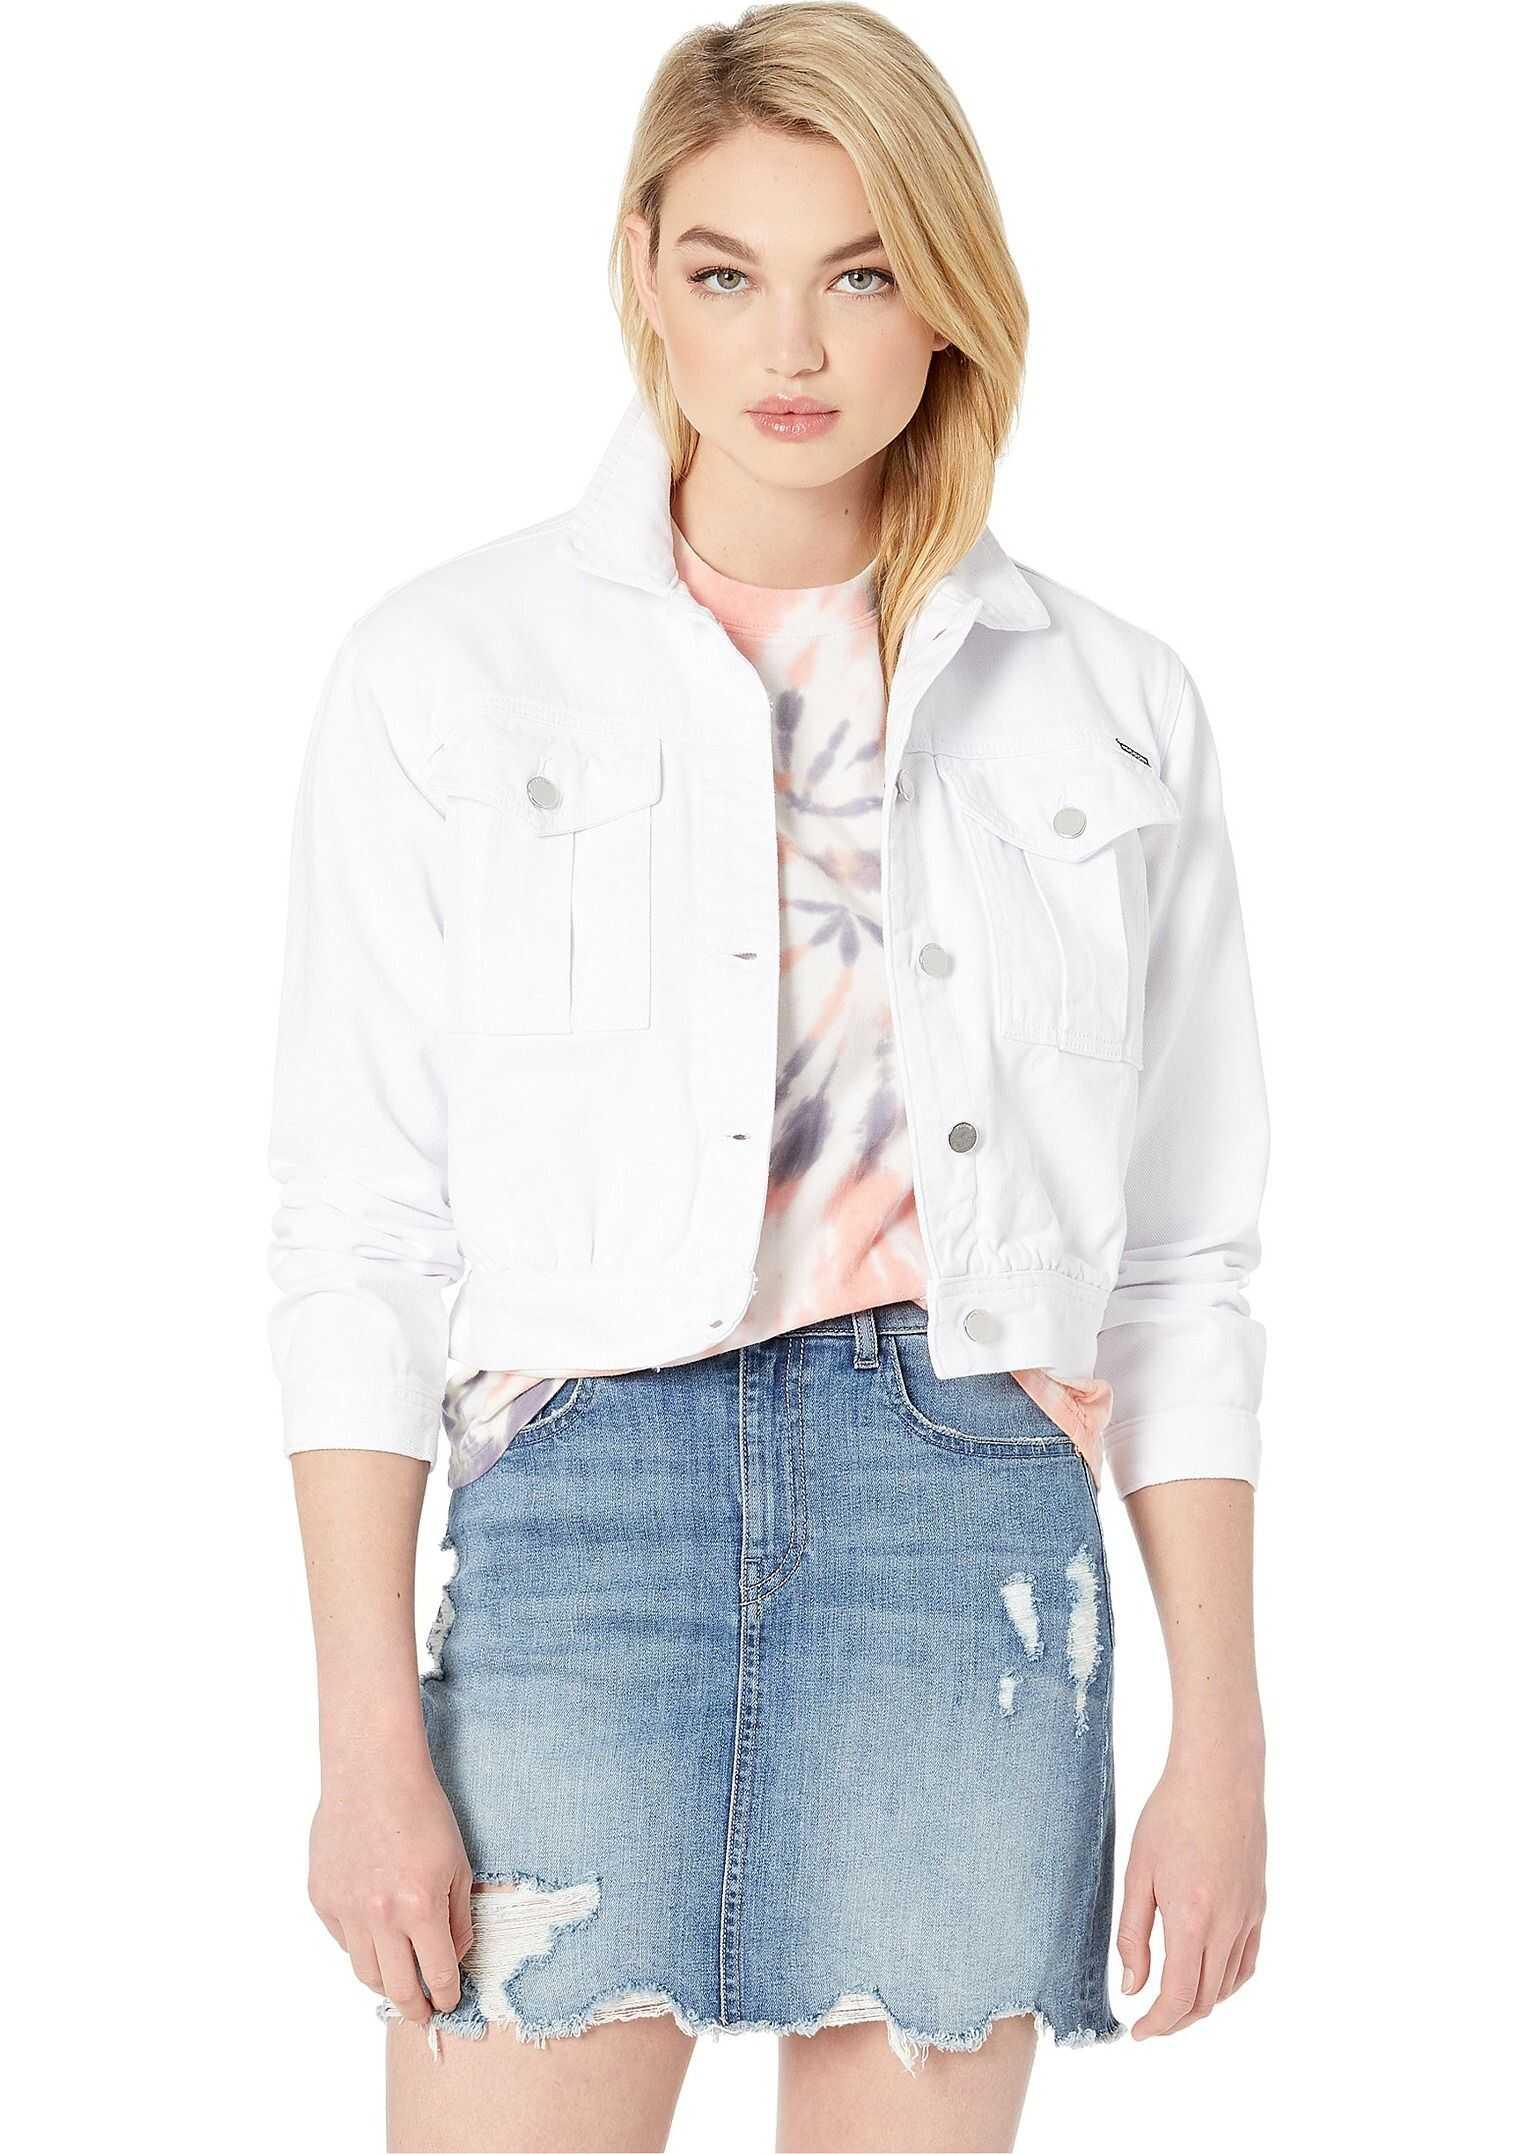 Volcom Fix It Denim Jacket White